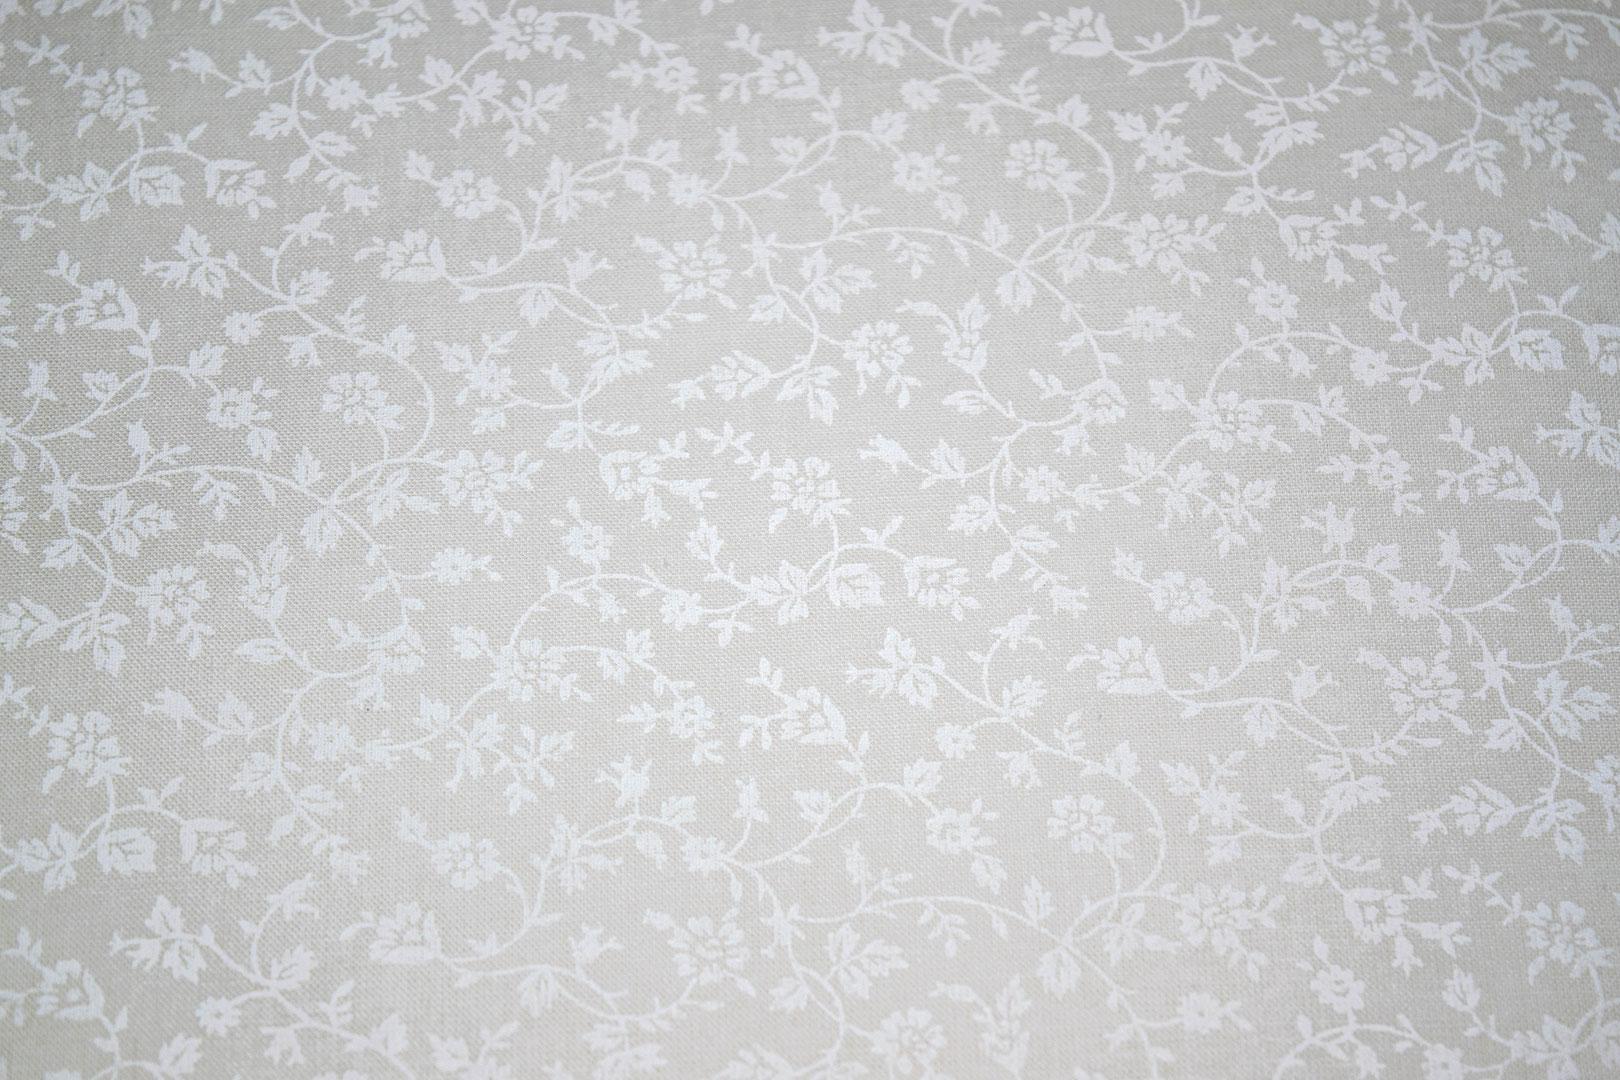 "8_36241_ww   44/45"" 68/68, 100% Carded Cotton"